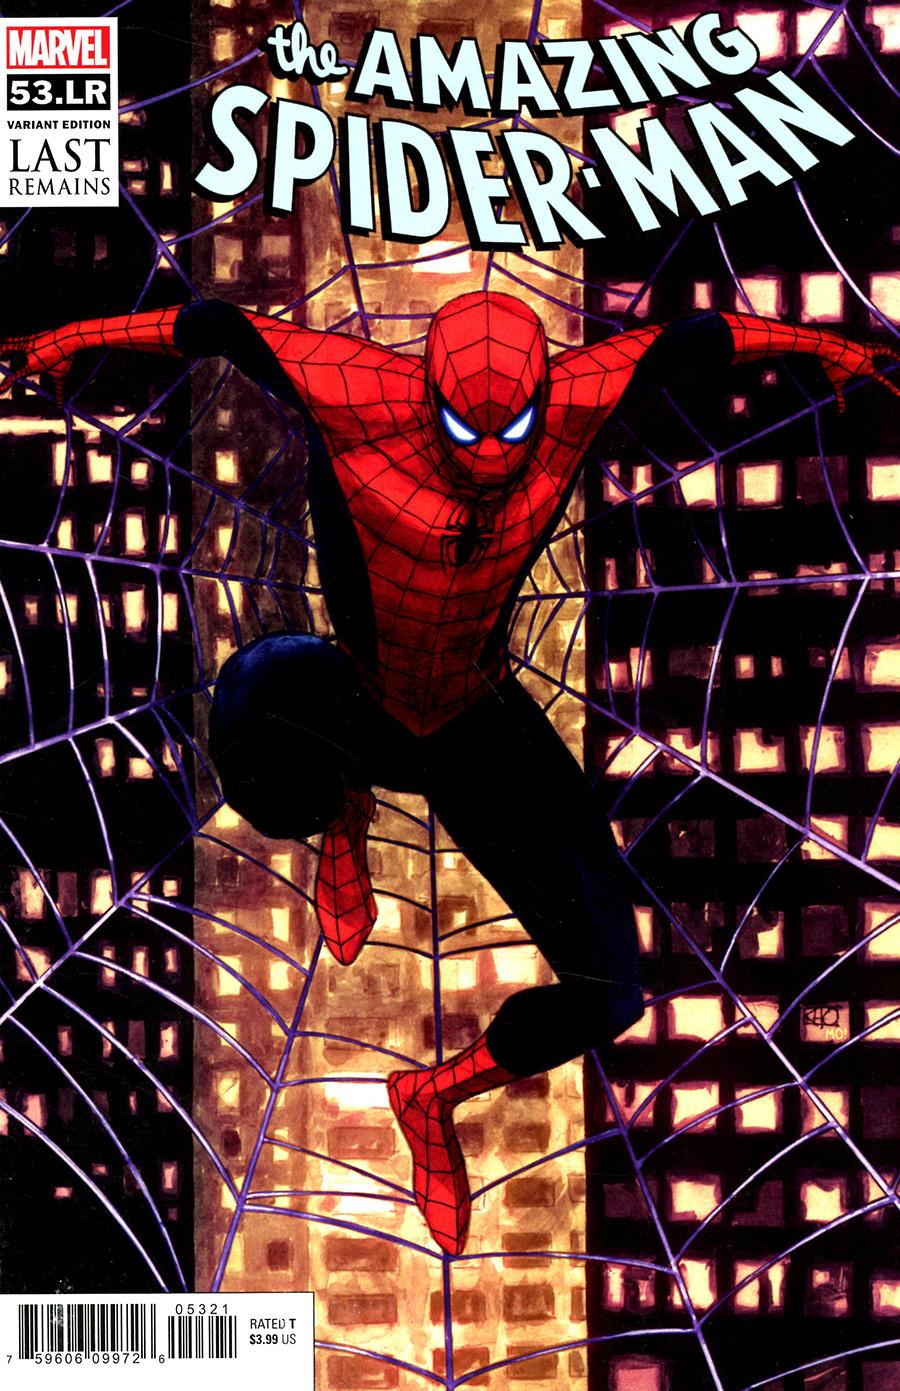 Amazing Spider-Man Vol 5 #53LR Cover B Variant Khoi Pham Cover